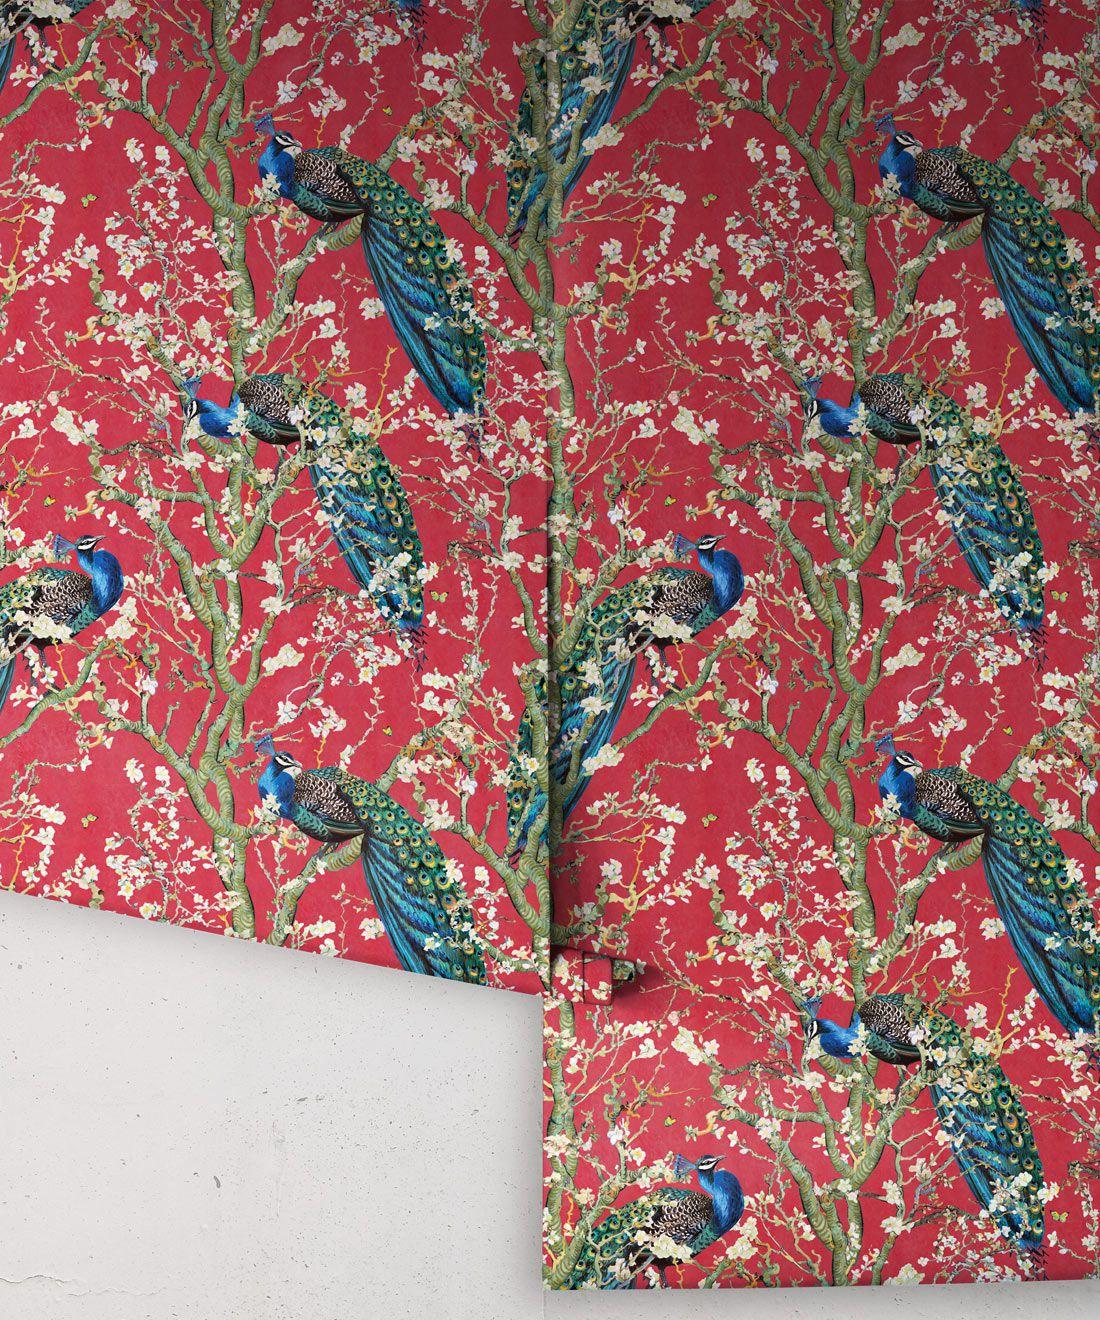 Almond Blossom Wallpaper • Chinoiserie Wallpaper • Wallpaper with Peacocks •Red Lantern Wallpaper •Rolls